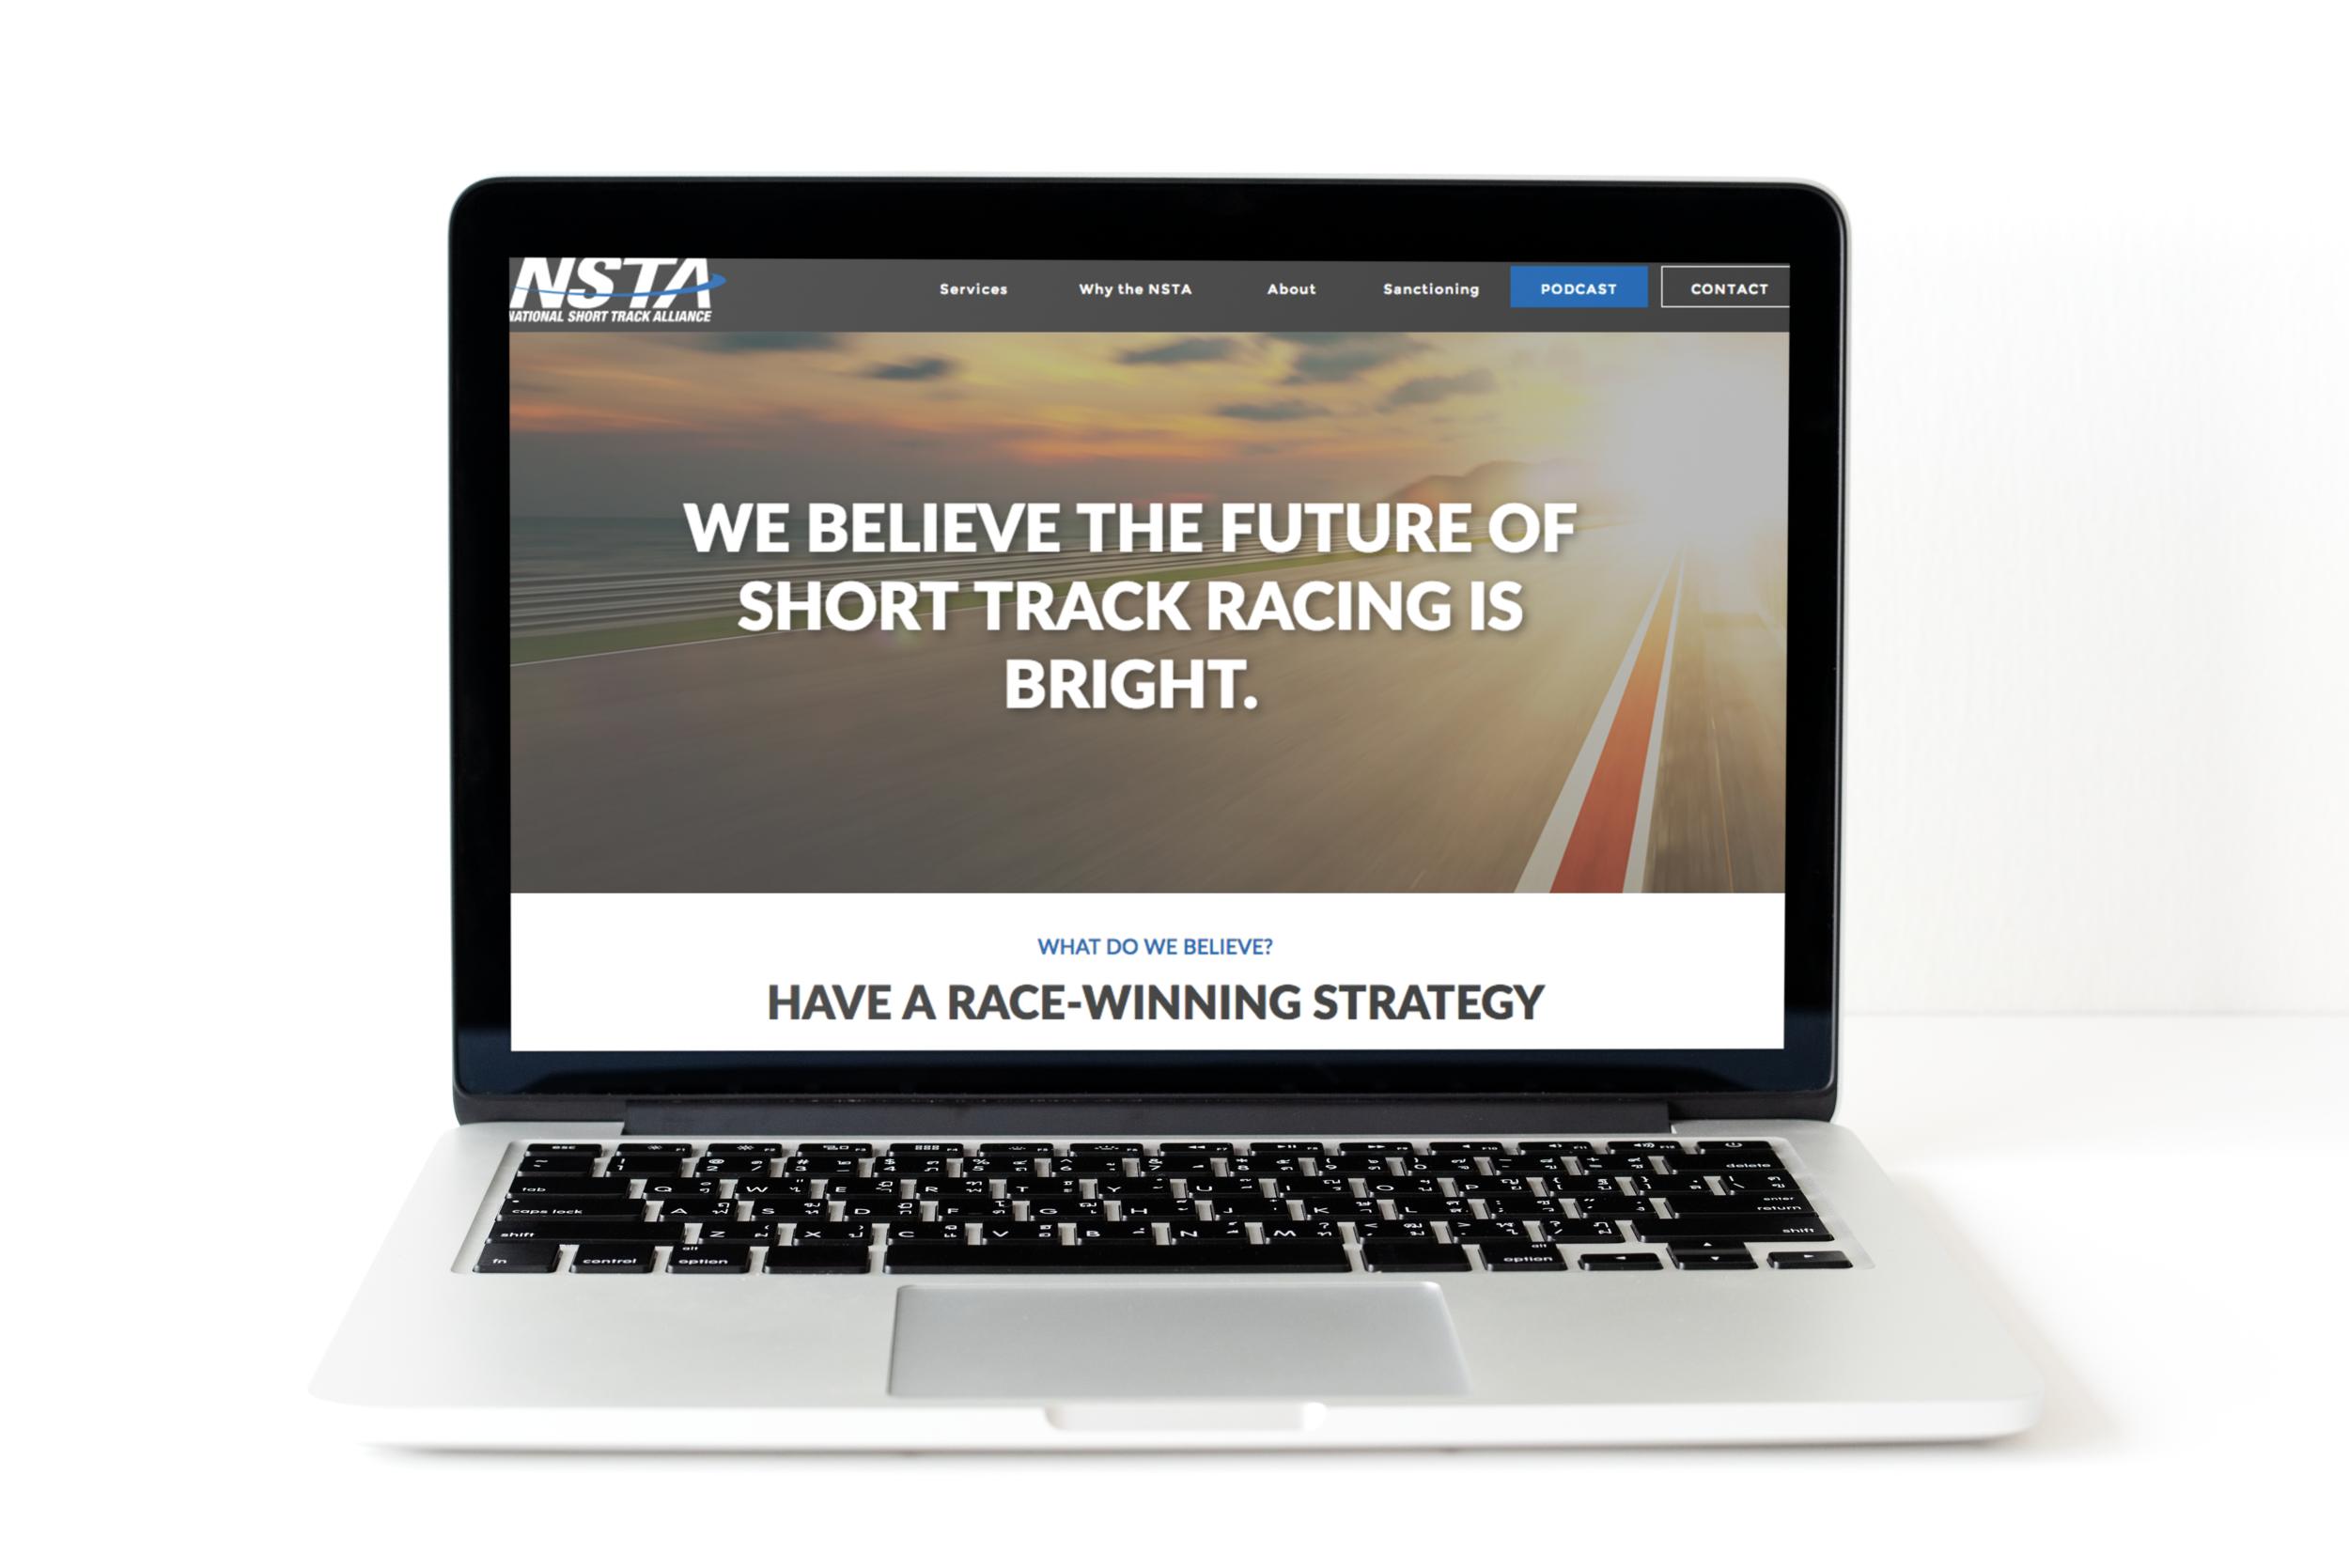 National Short Track Alliance - Website design and development, branding